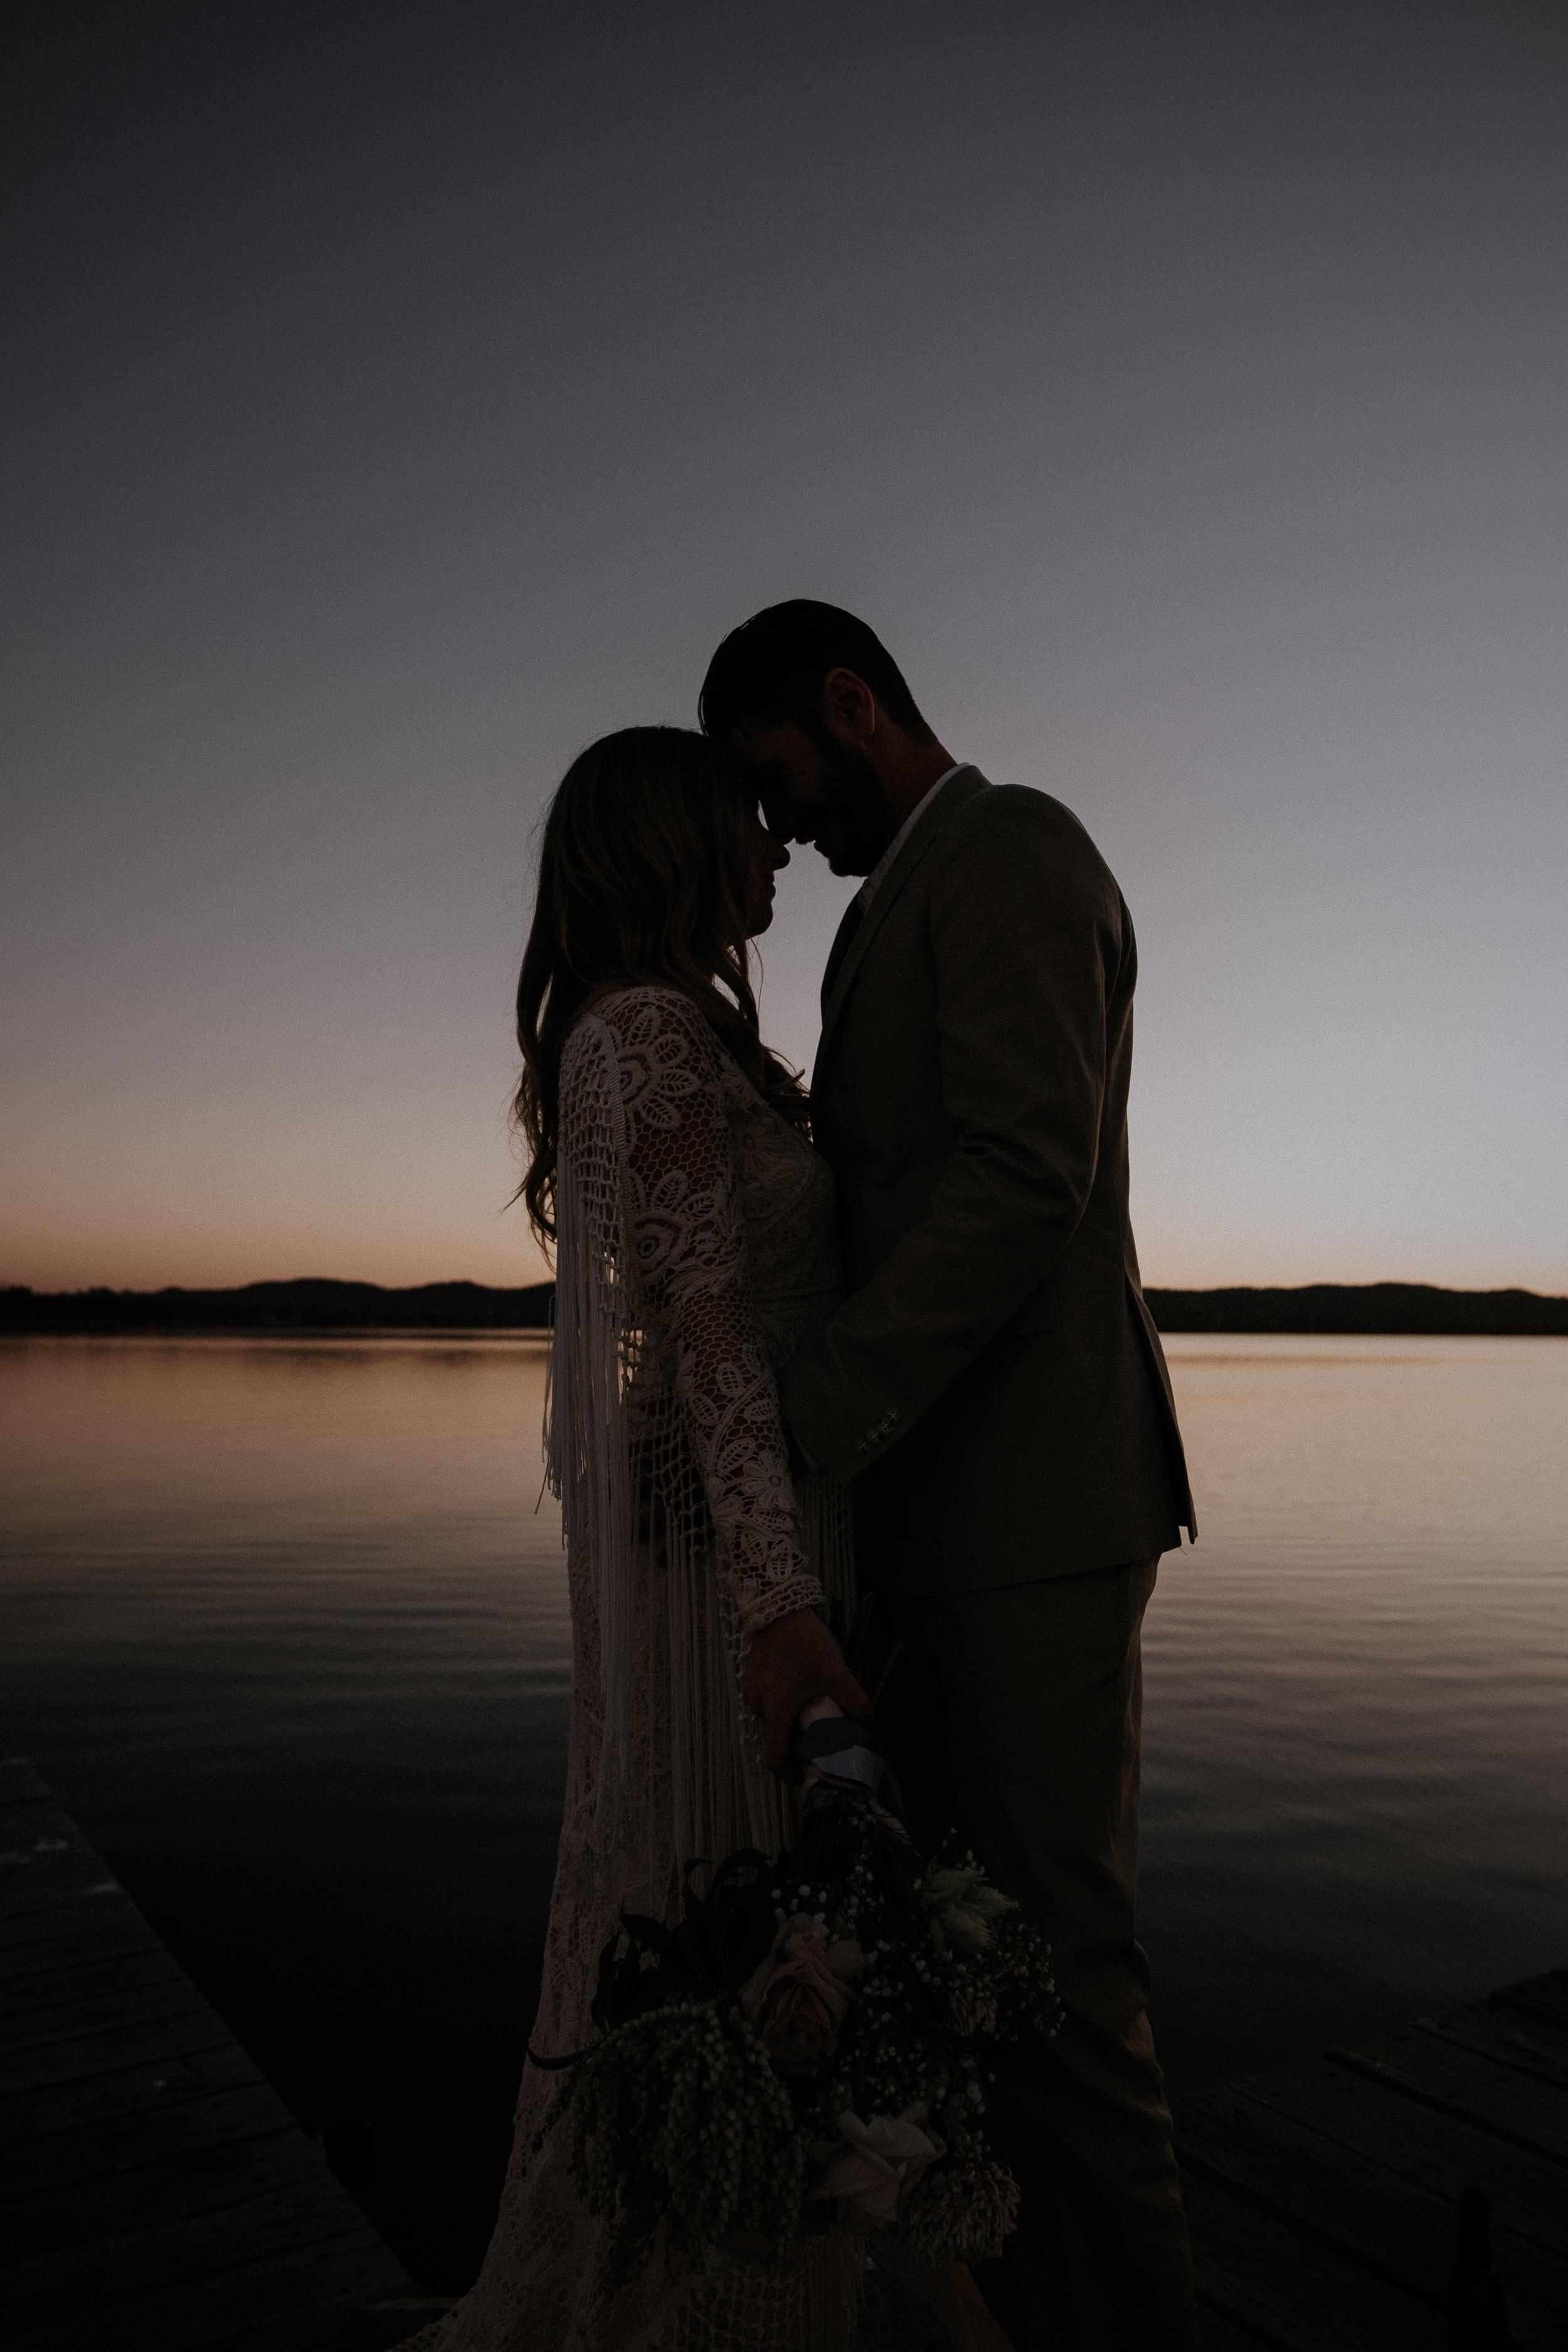 S&A Elopement - Kings & Thieves - Shred 'Til Dead - Central Coast Beach Forest Wedding - 402.jpg